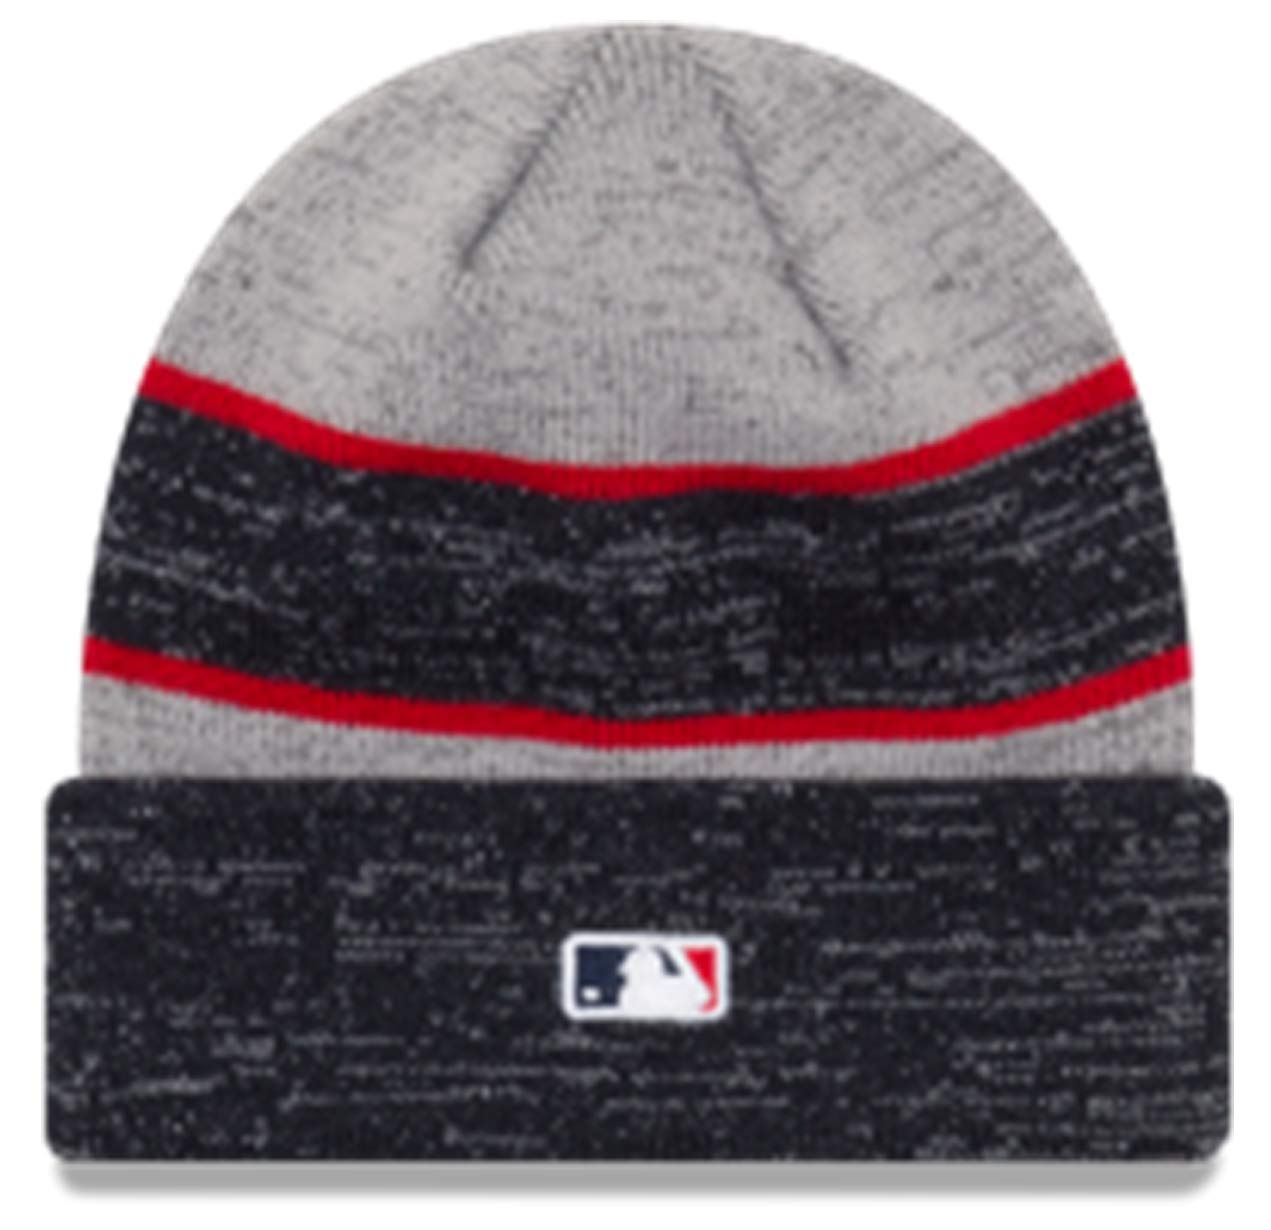 85e2c6b68f4 Amazon.com  New Era Authentic Atlanta Braves 2017-18 Cuff Sport Knit MLB  Onfield Sideline Beanie Unisex Hat Gray Navy